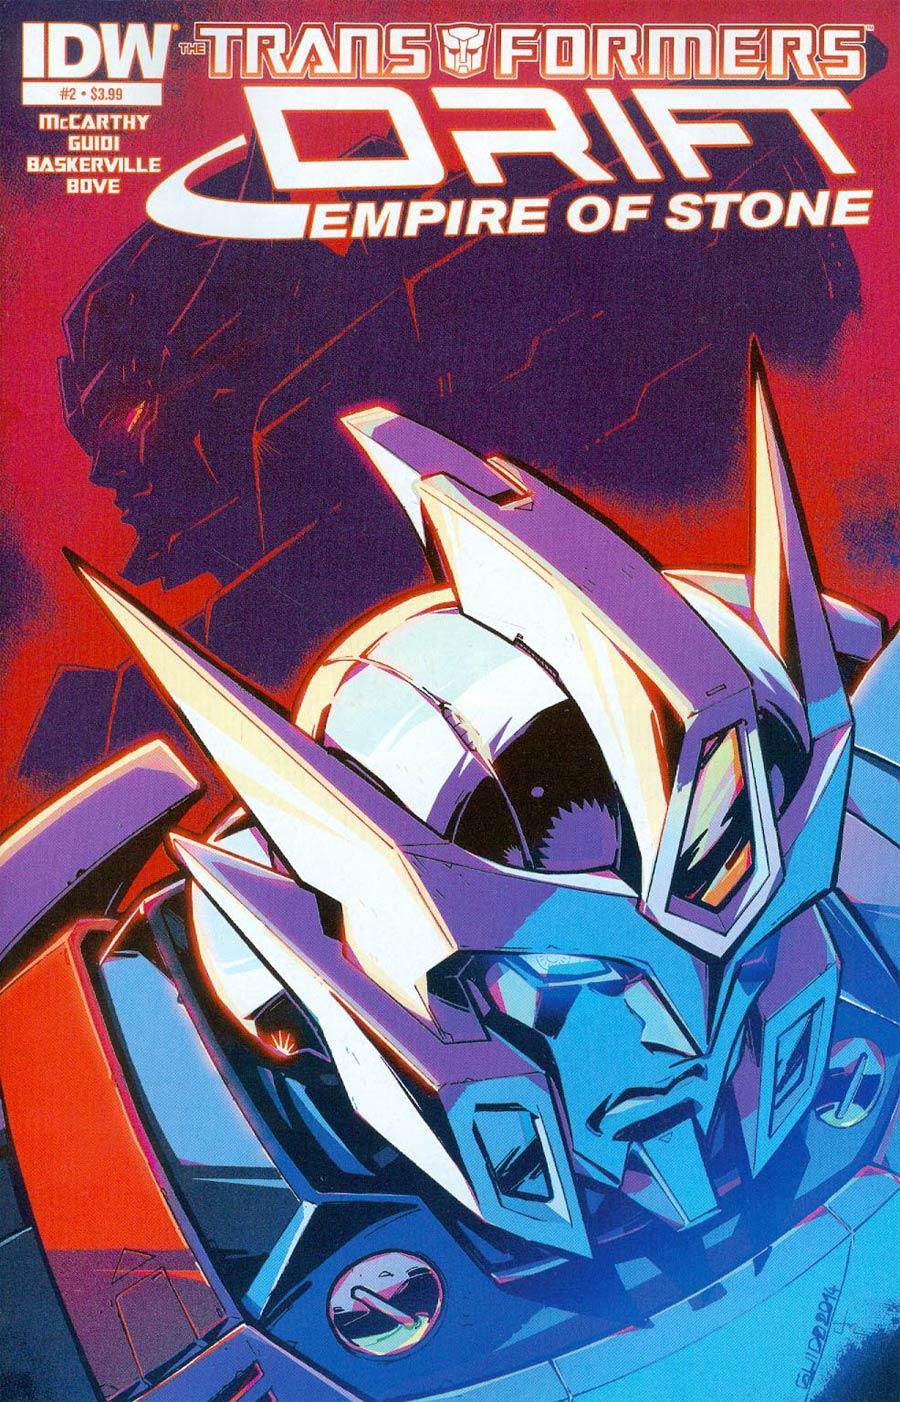 Transformers Drift Empire Of Stone #2 Cover A Regular Guido Guidi Cover